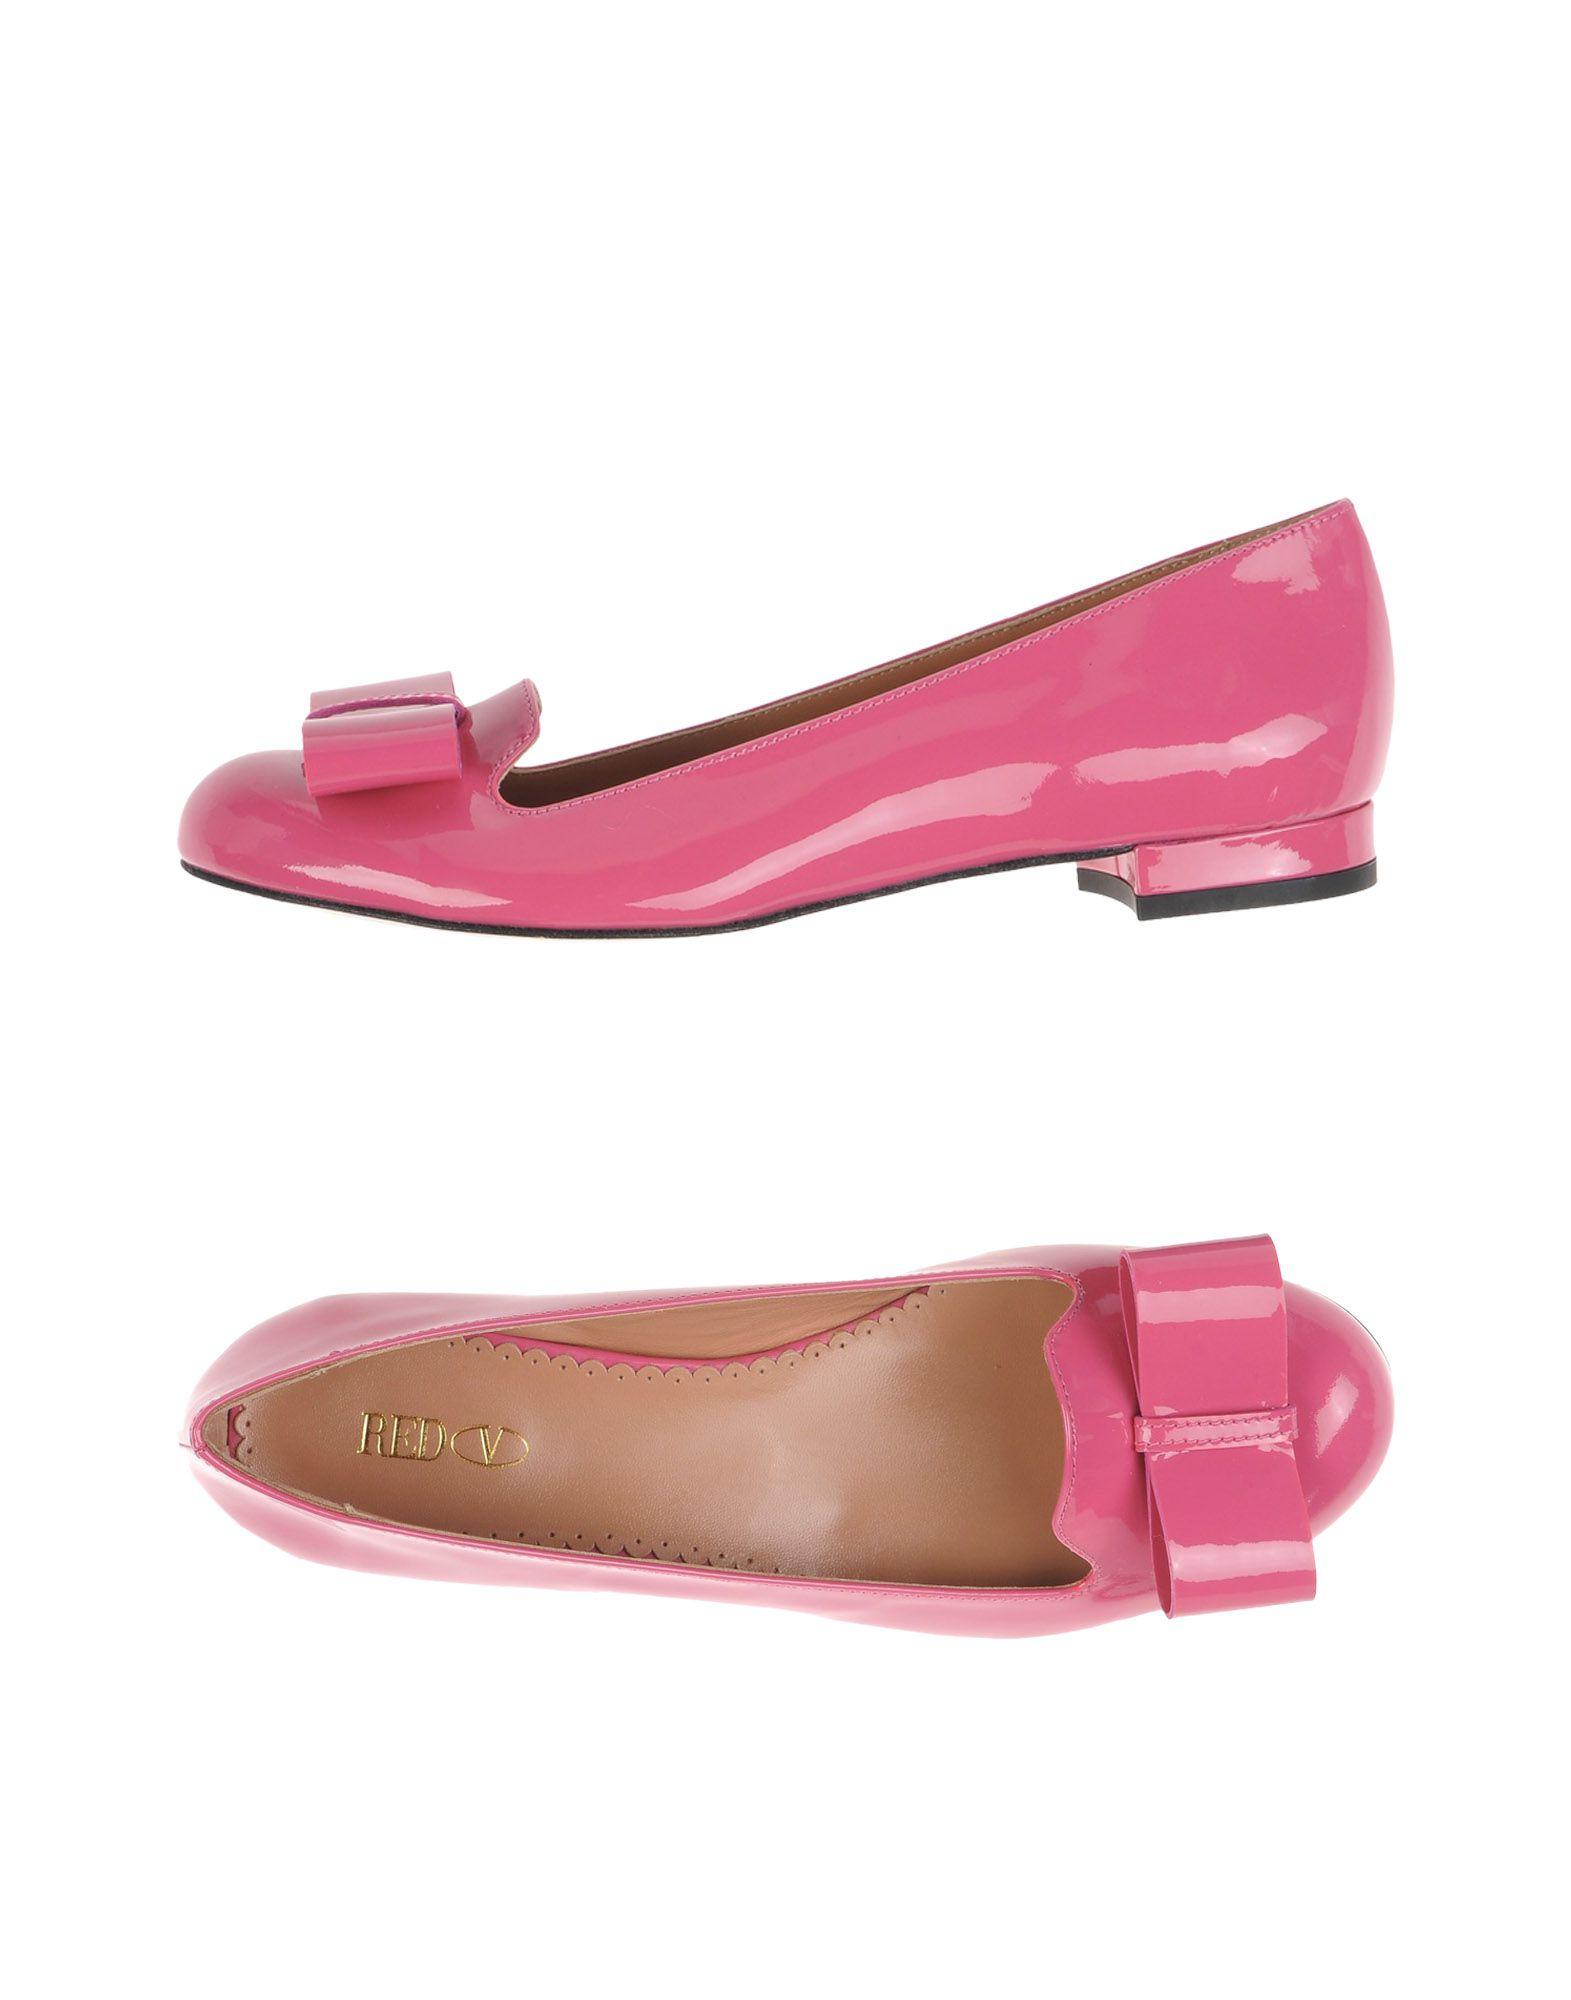 redv female redv loafers